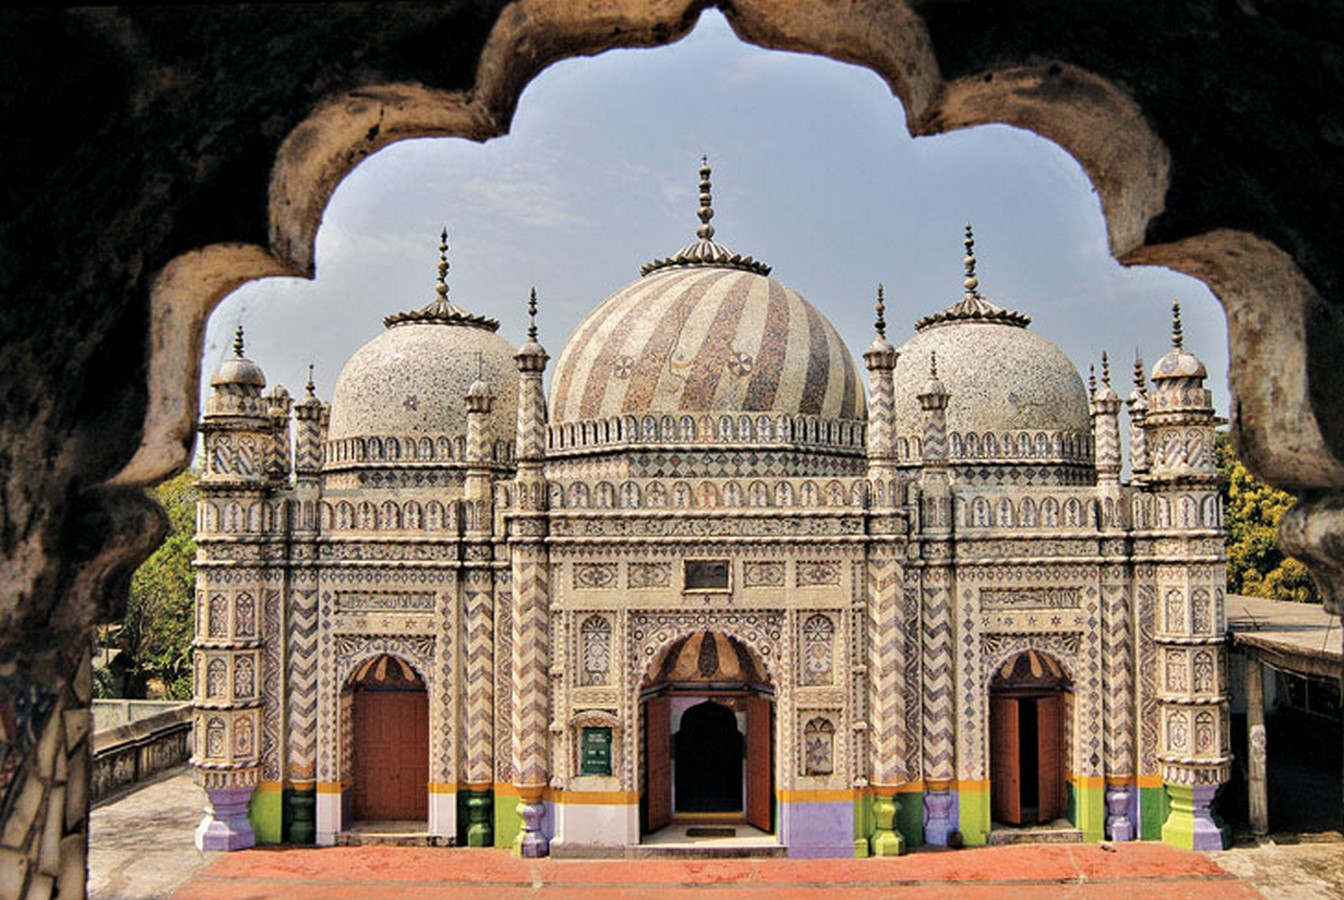 Heritage Mosques in Bangladesh - Sheet1